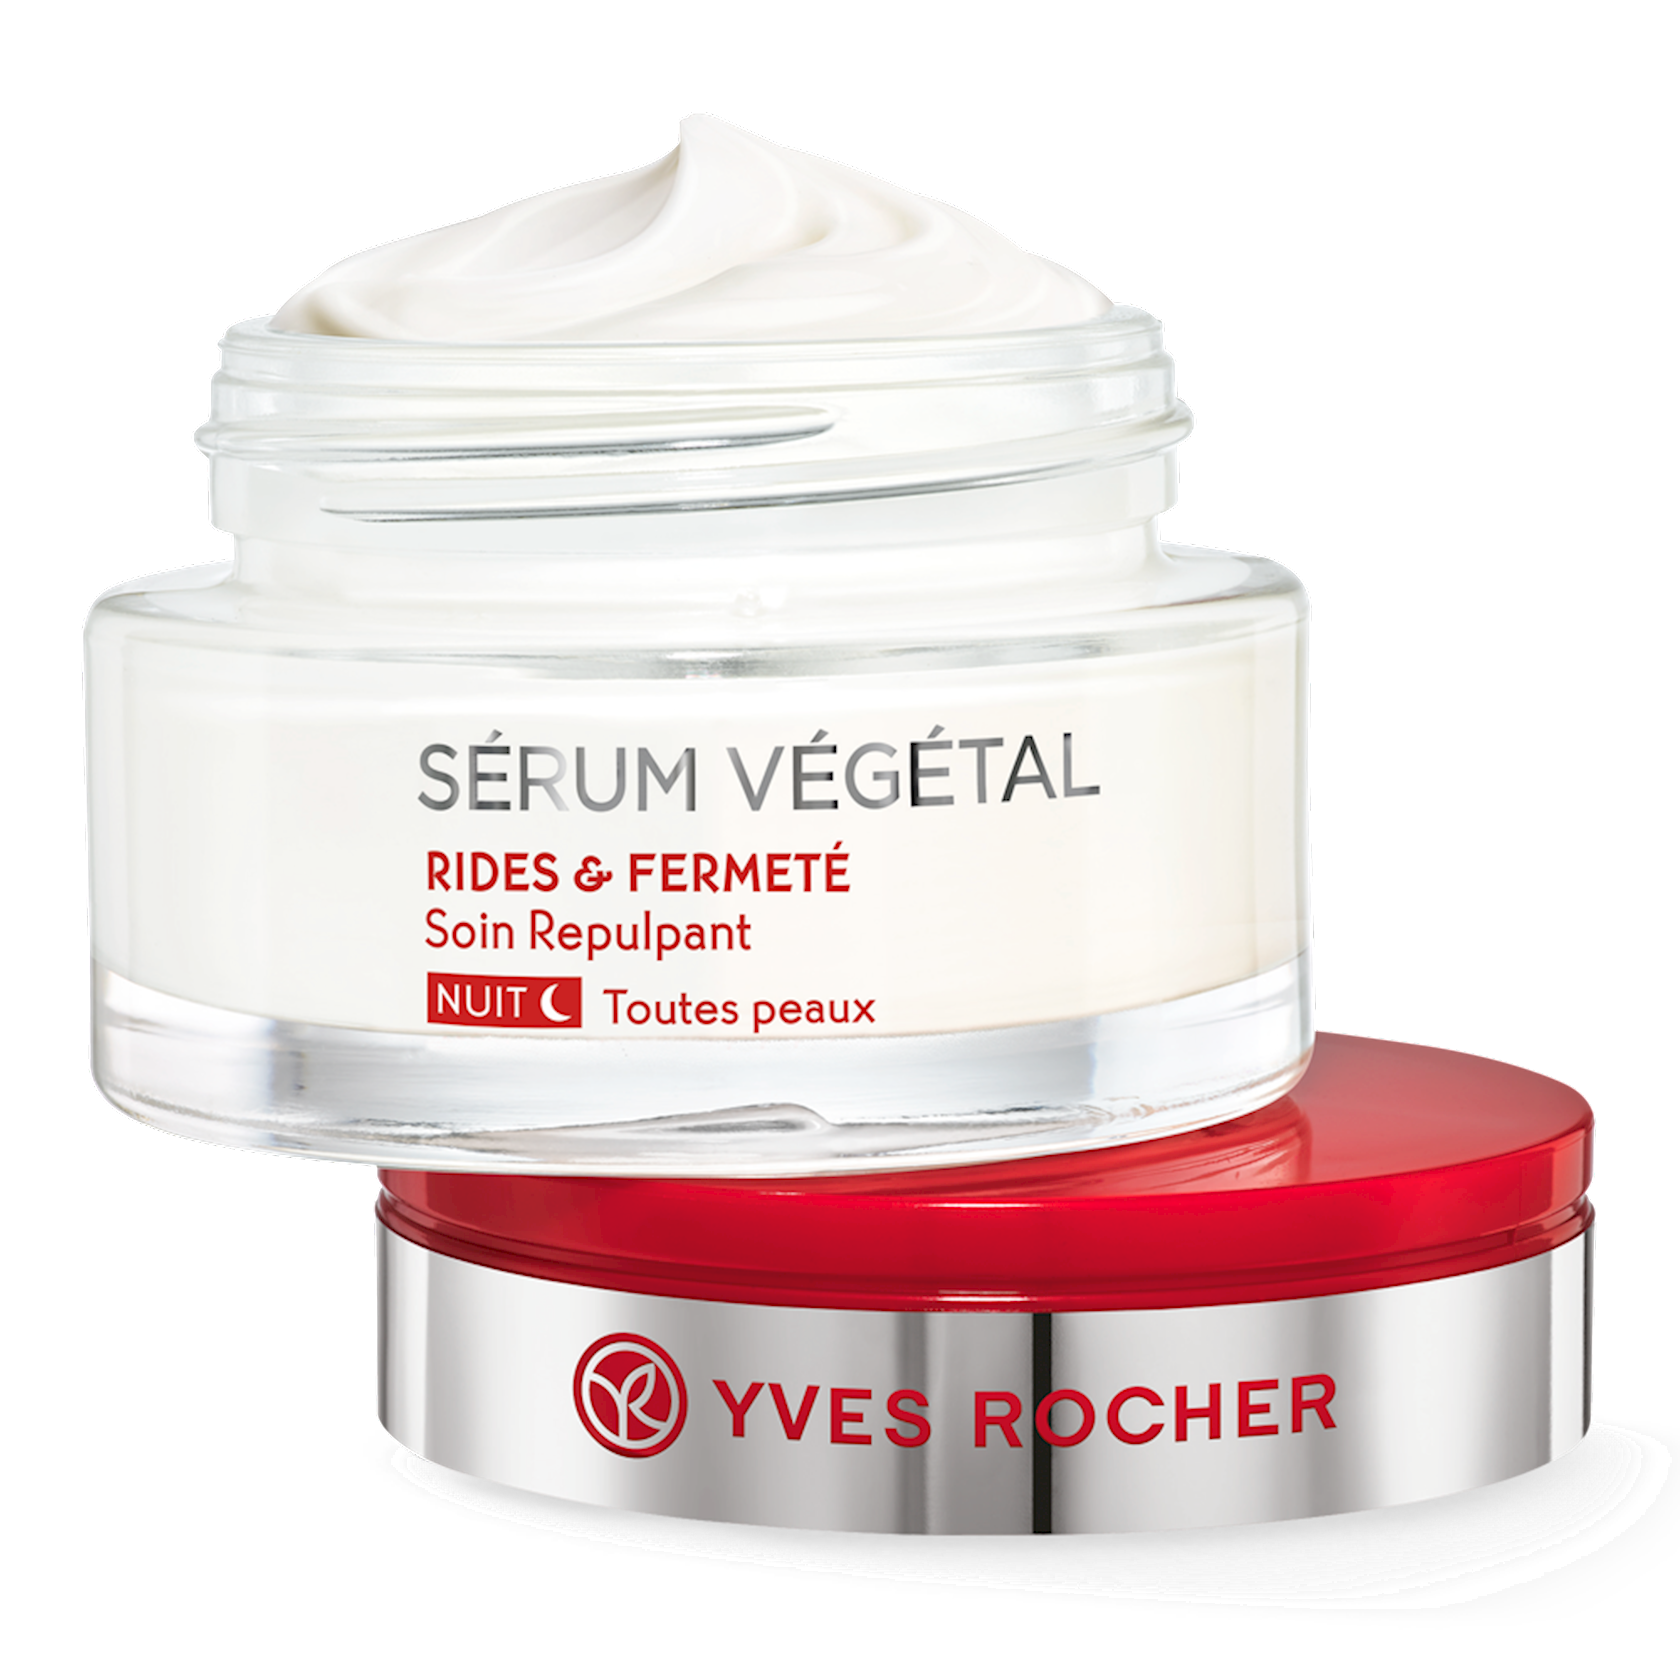 Üz üçün krem Yves Rocher Plumping Night Care - Wrinkles & Firmness